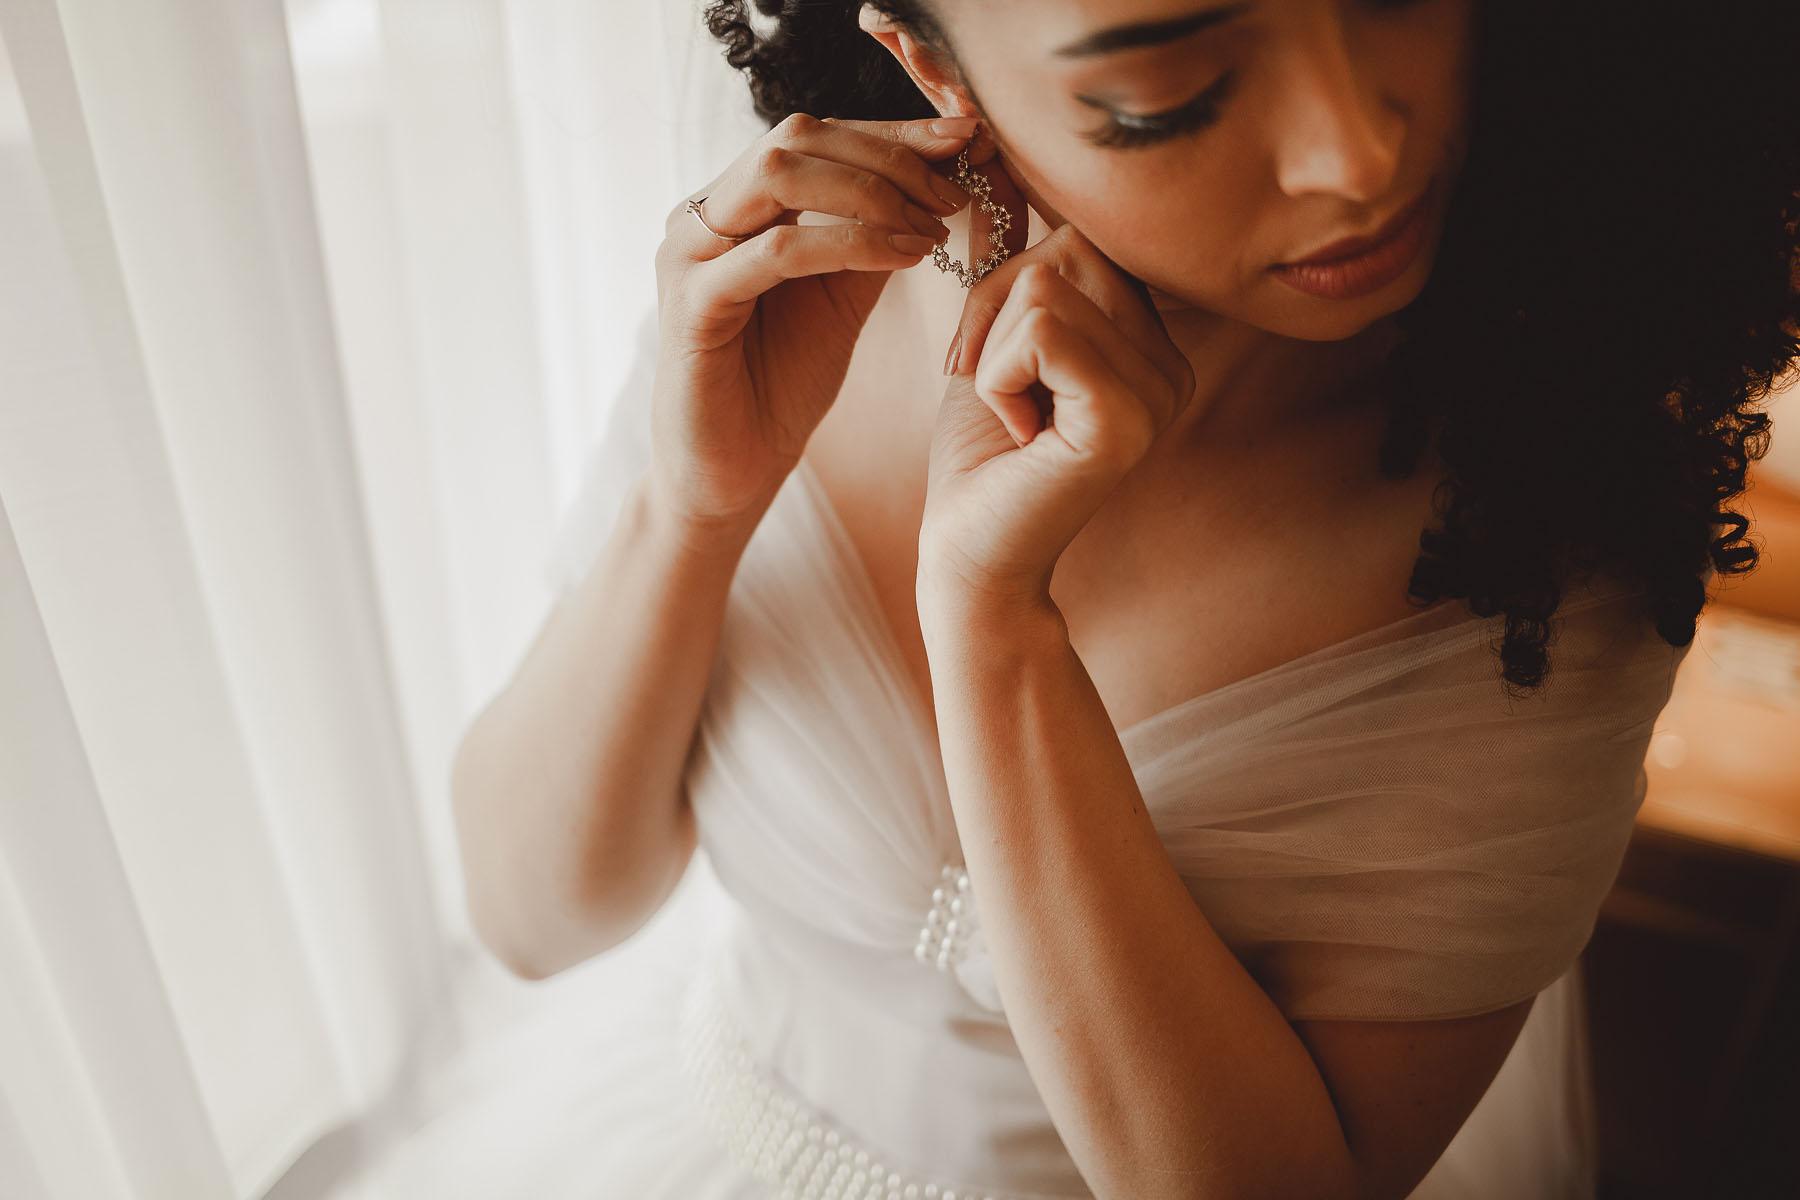 dia-da-noiva-no-hotel-casamento-vai-menina